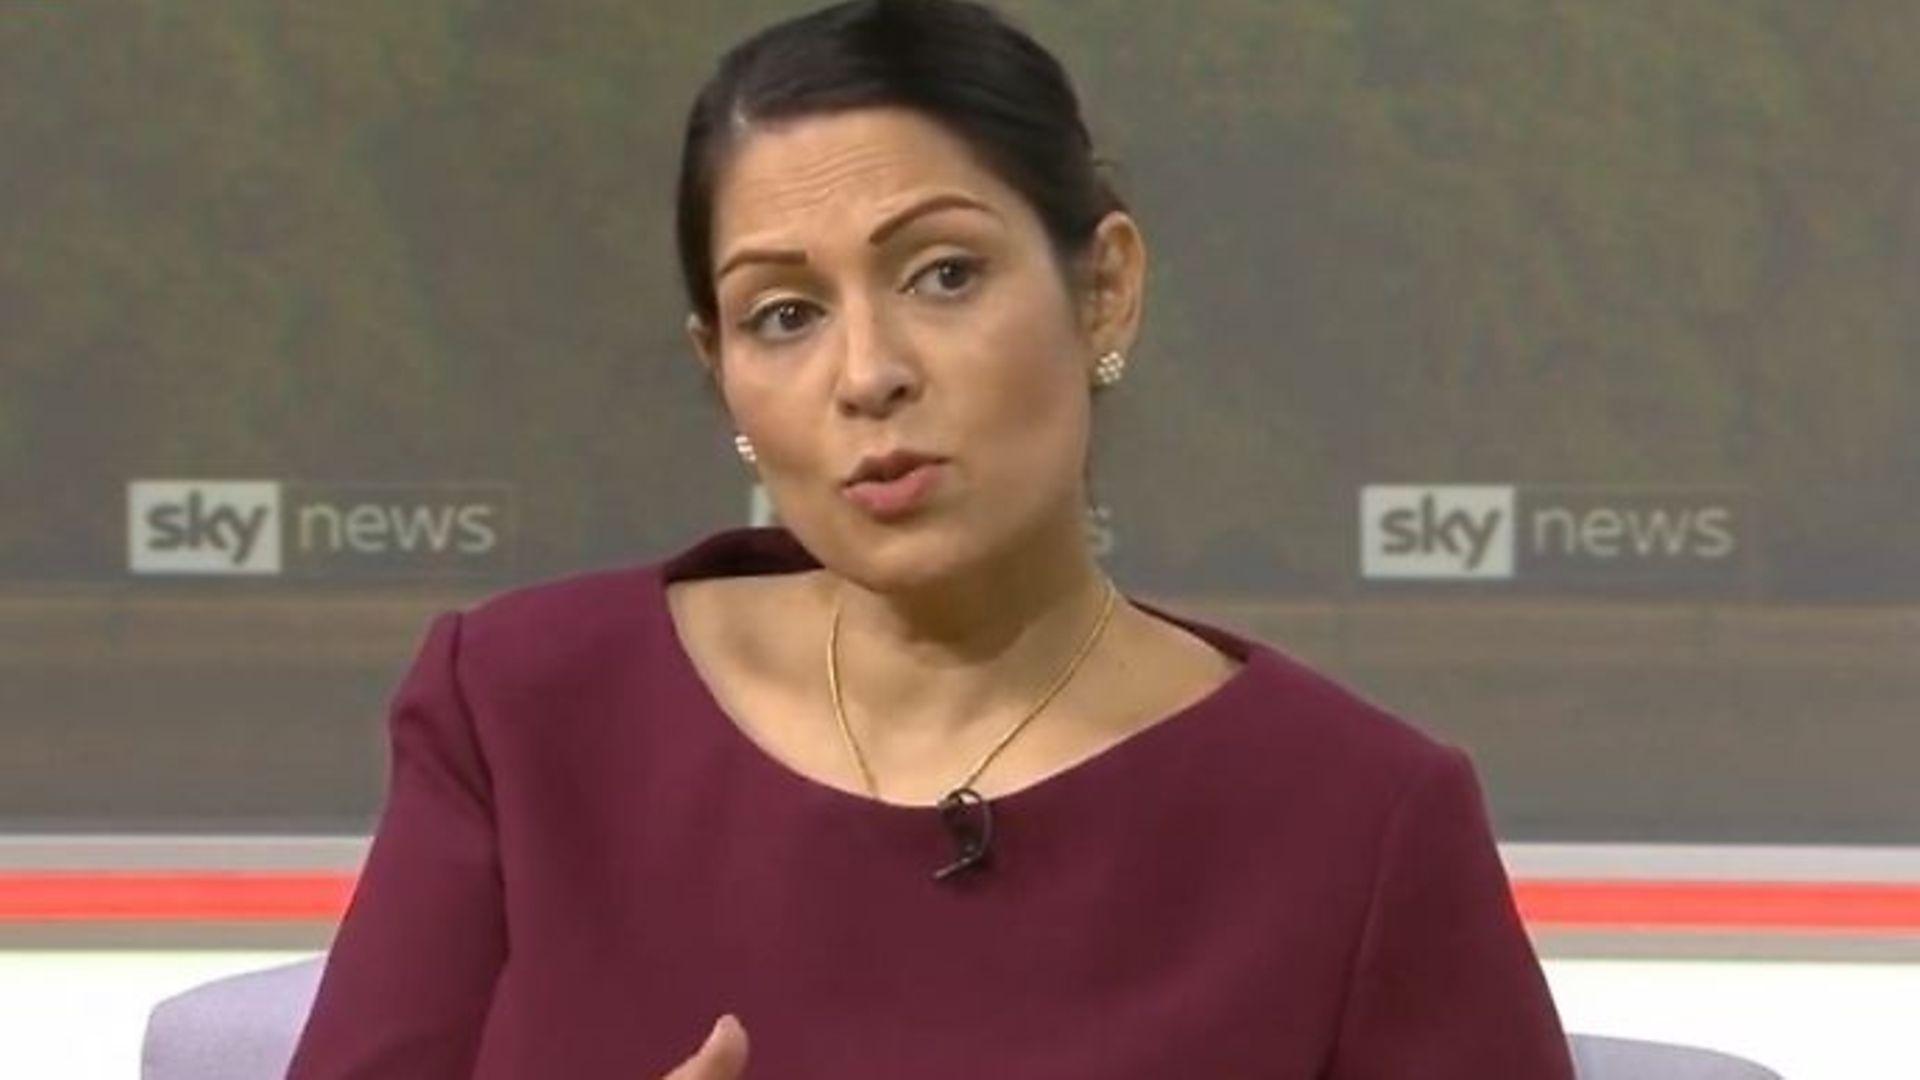 Priti Patel on Sky News - Credit: Sky News